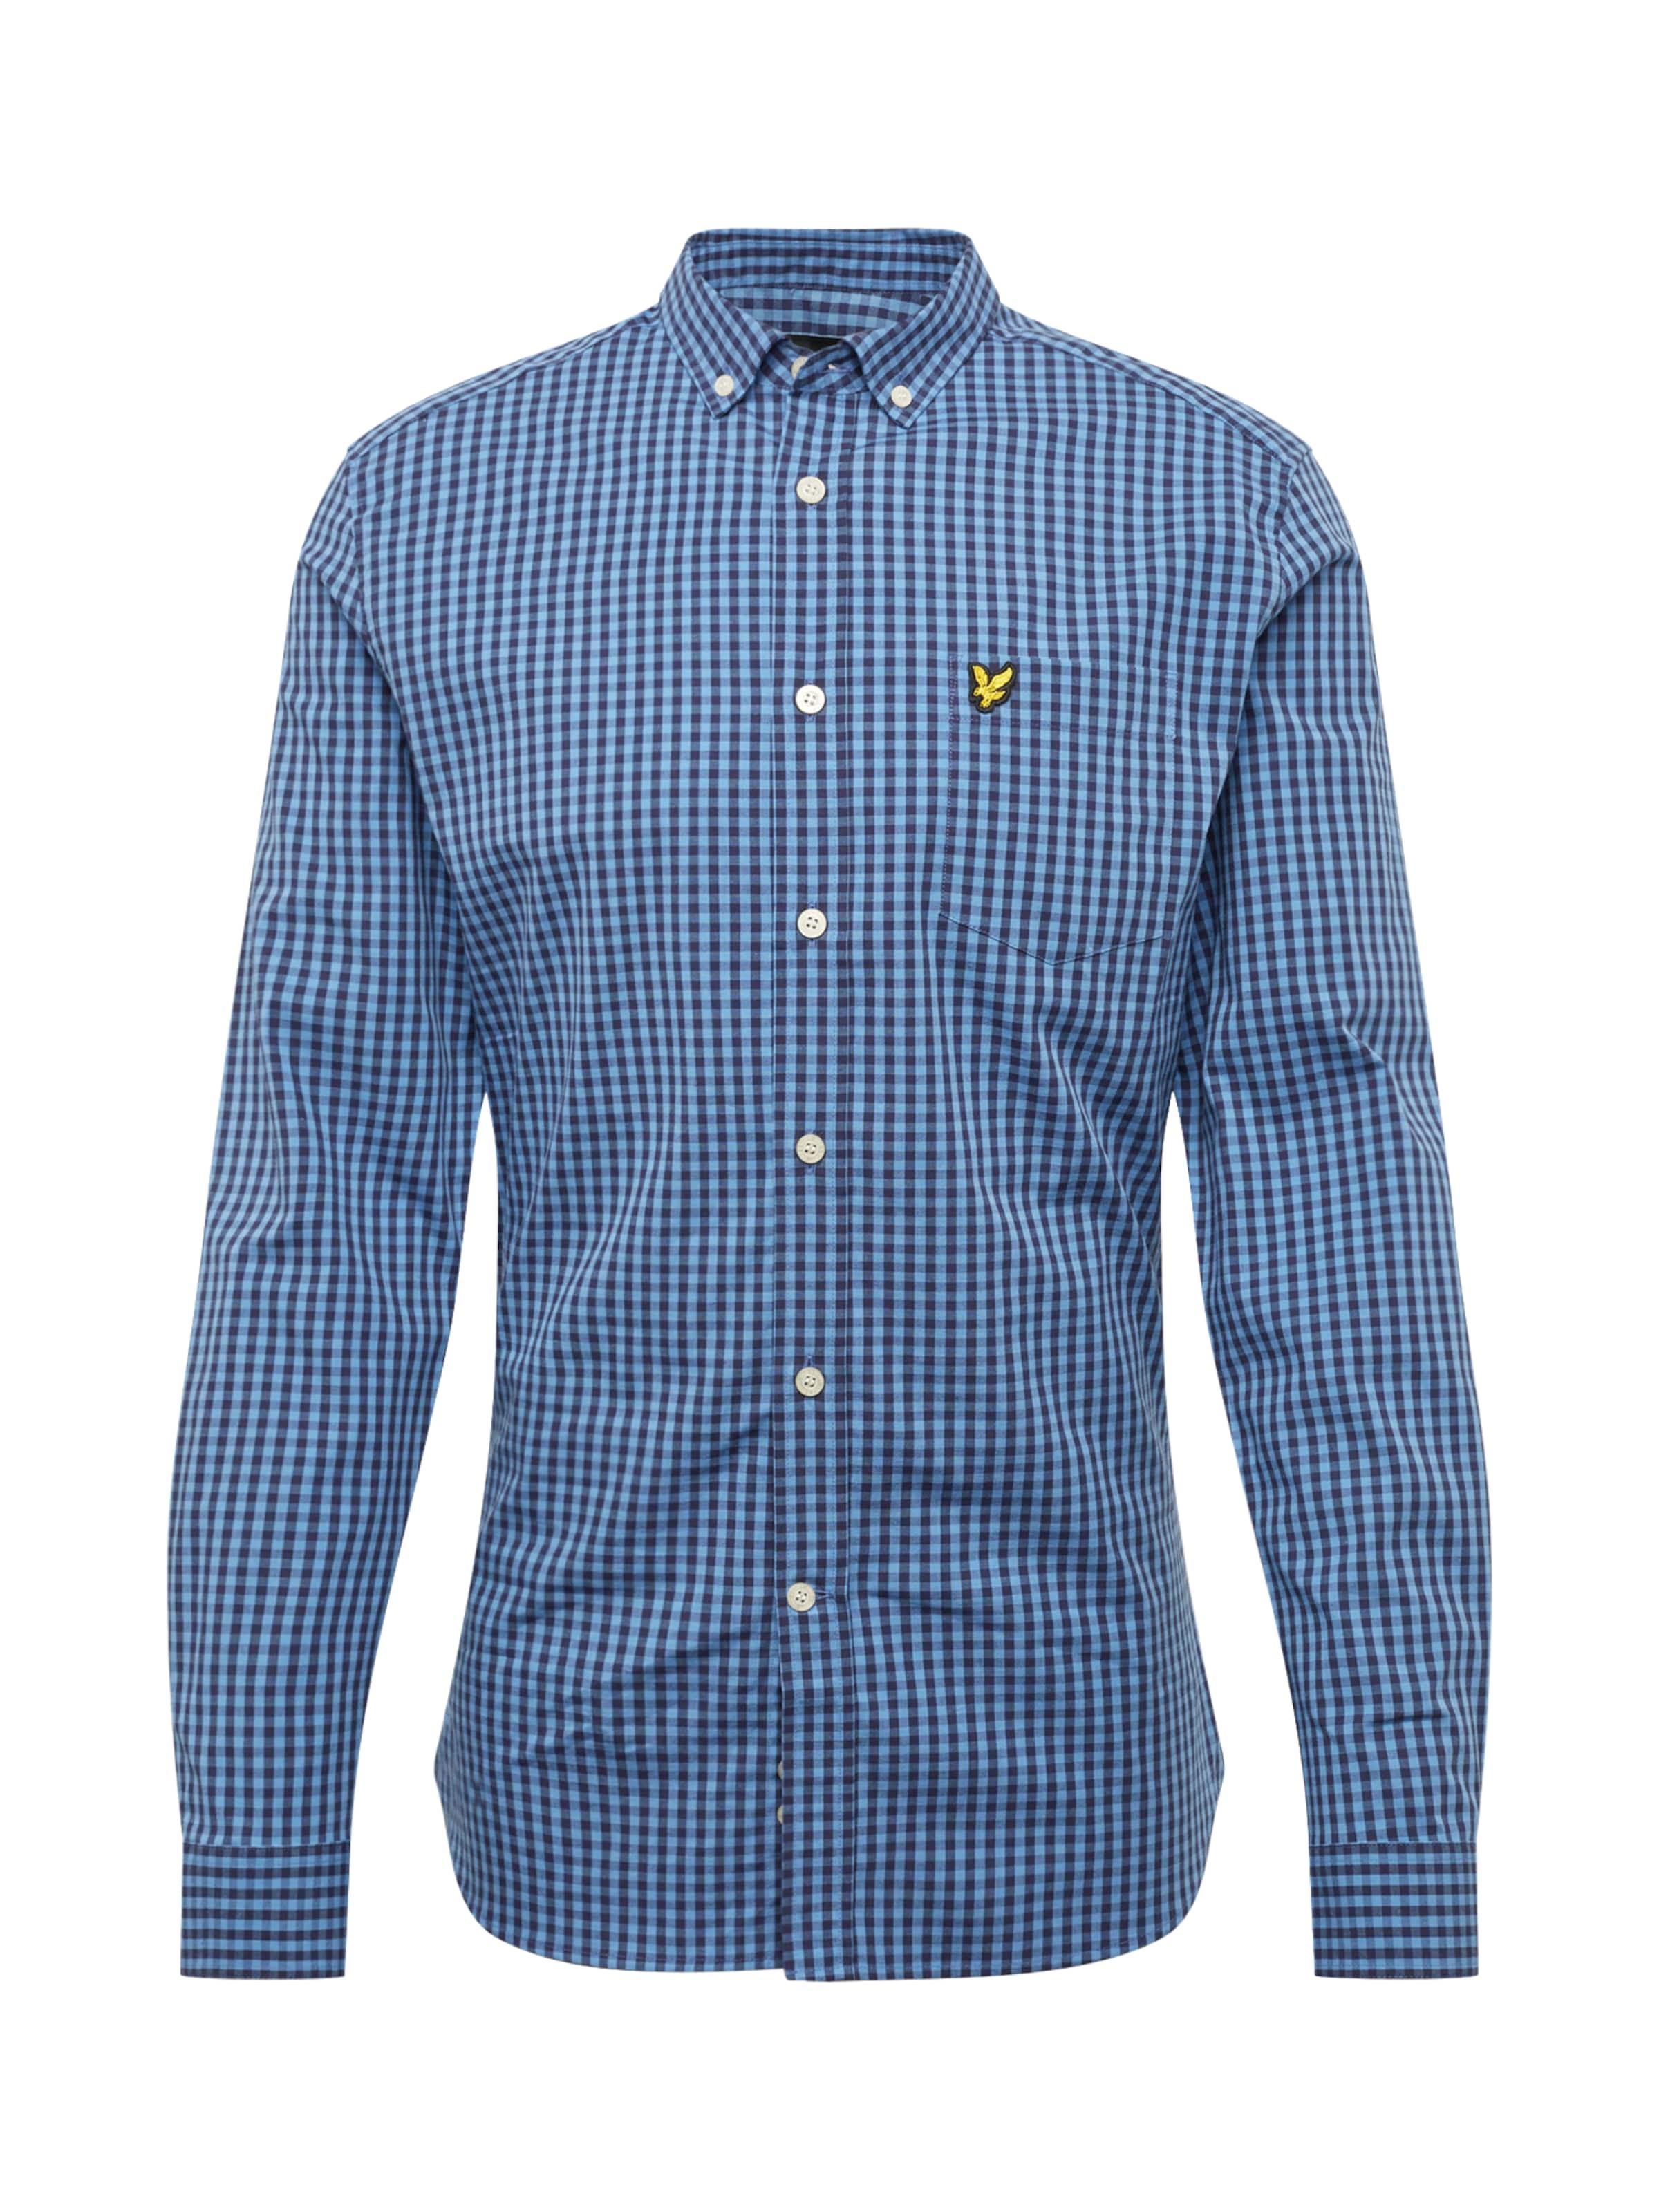 Fit Scott En BleuBlanc Chemise Slim Gingham 'ls Lyleamp; Shirt' 5jL34RAq